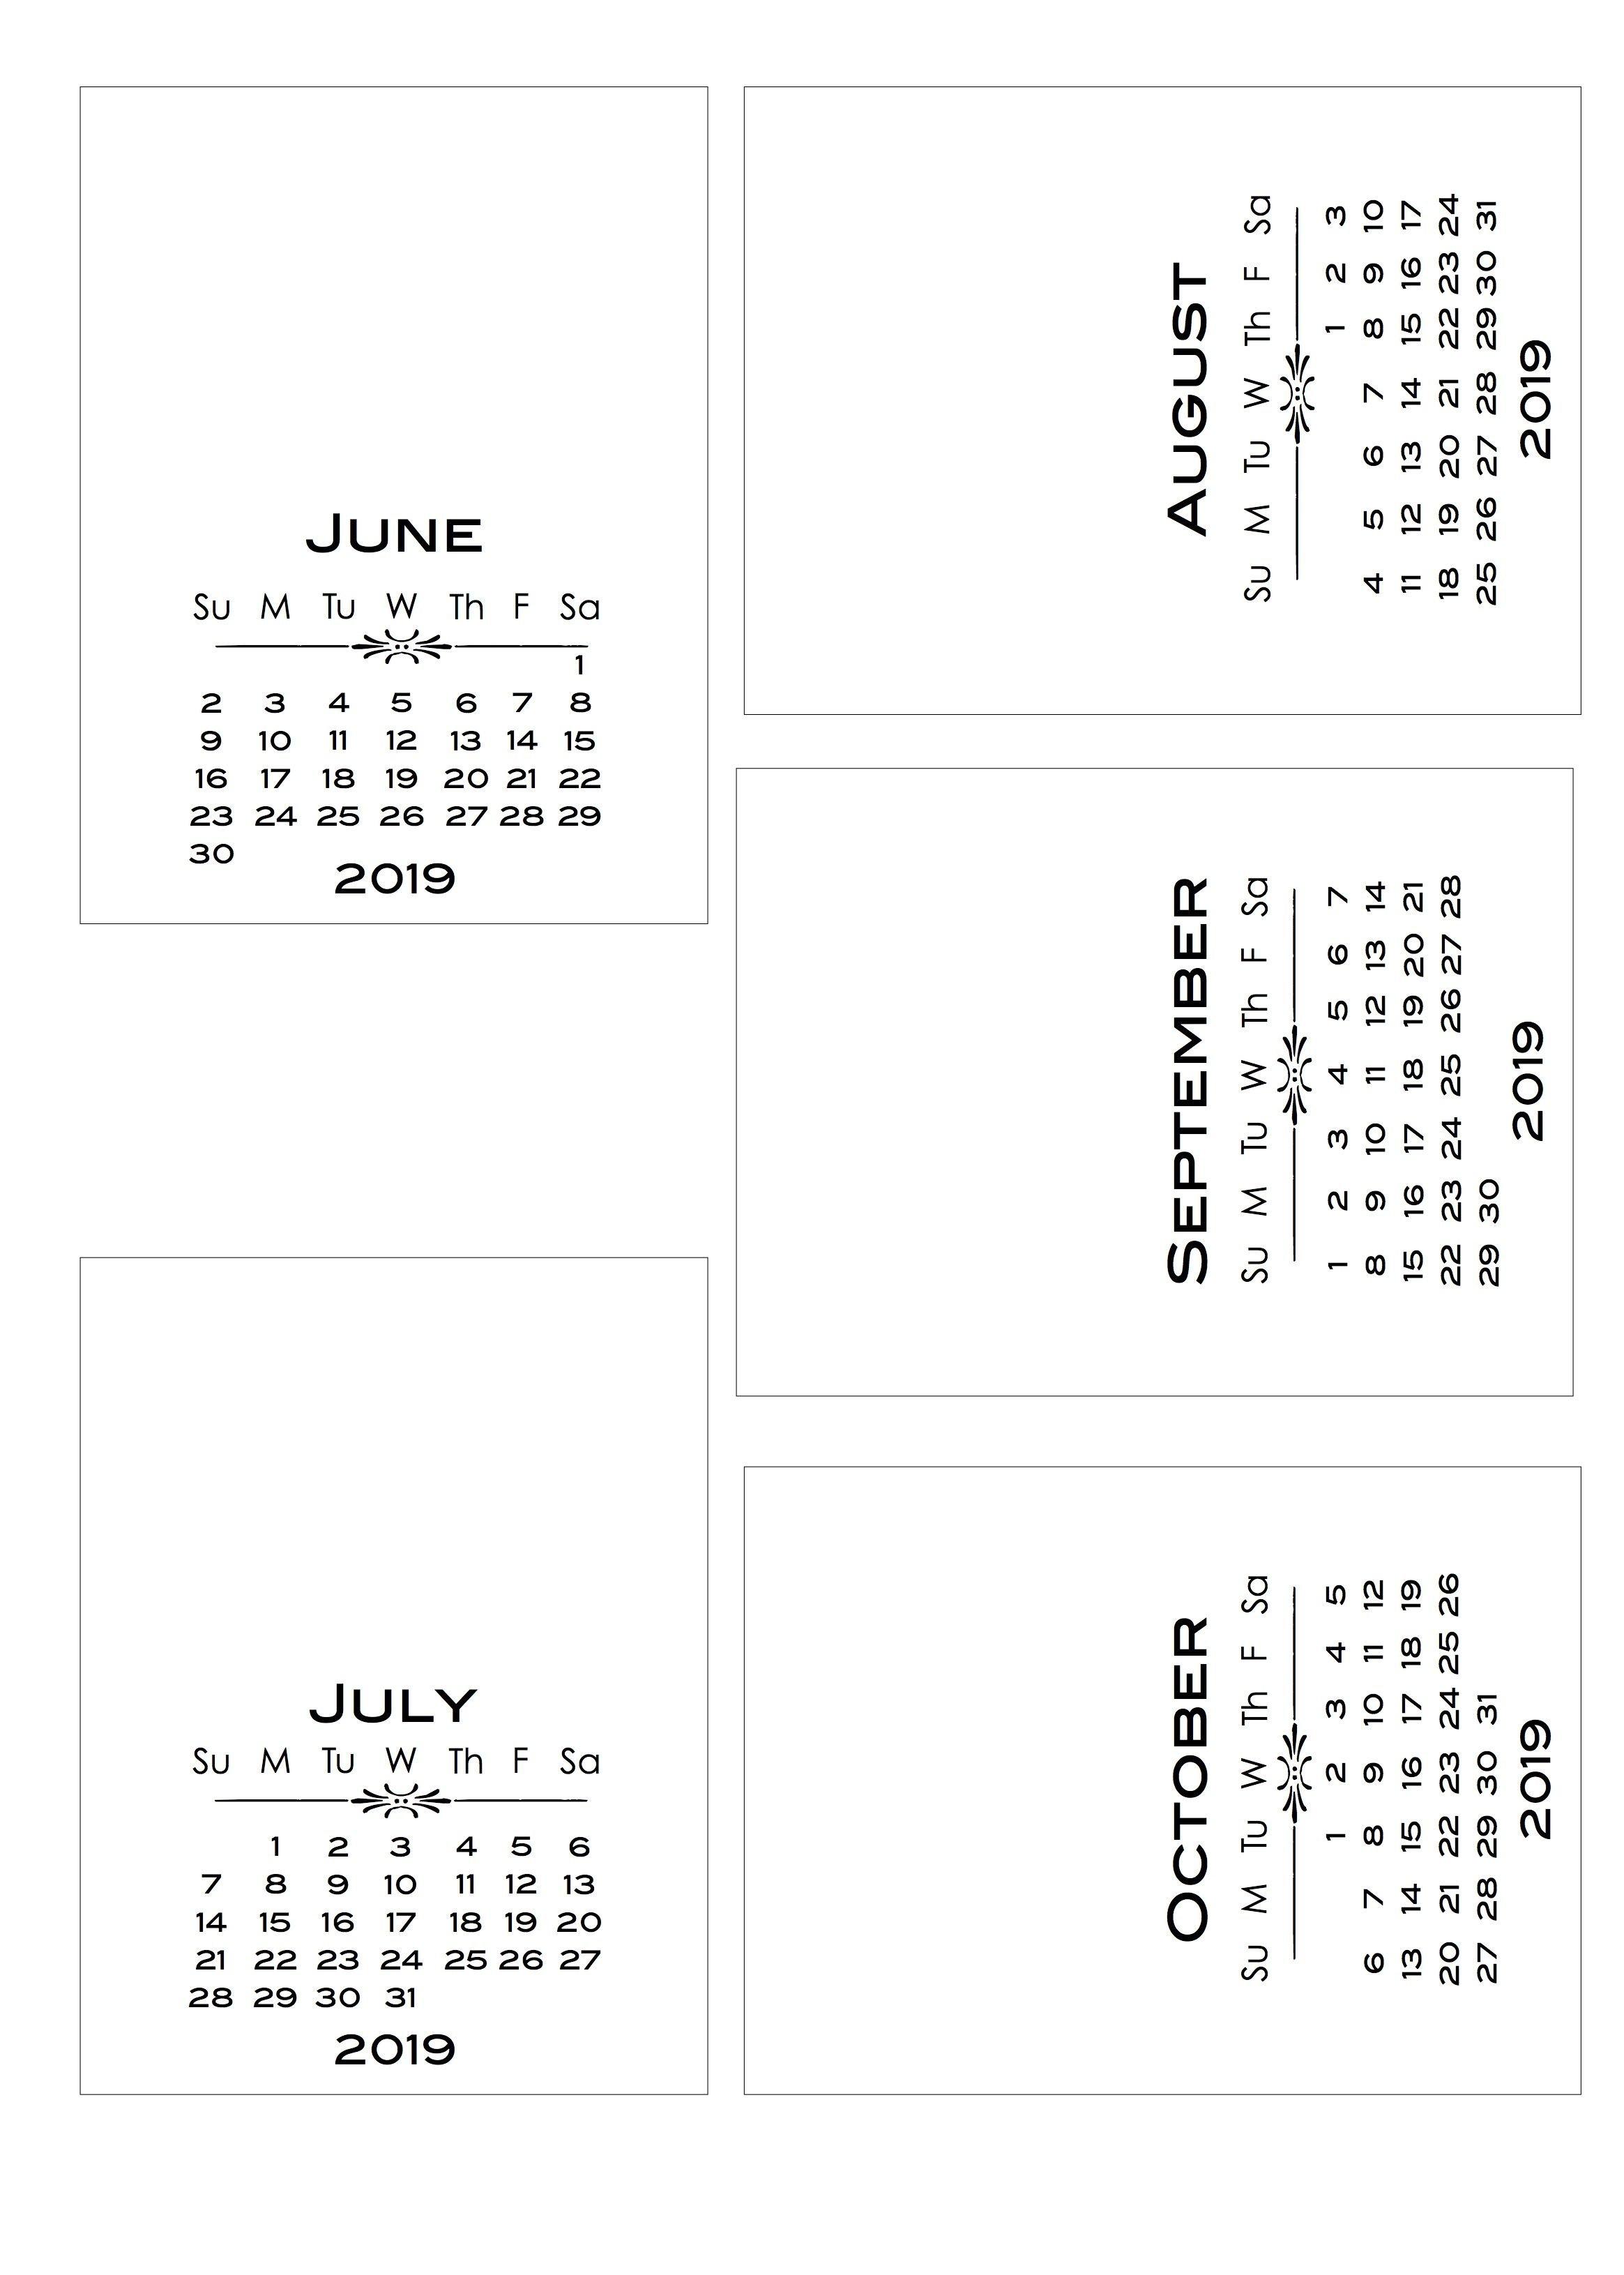 2019 Diy Calendar With Bold Text Pl-Style Cards | Calendar | Diy Calendar 2019 Diy